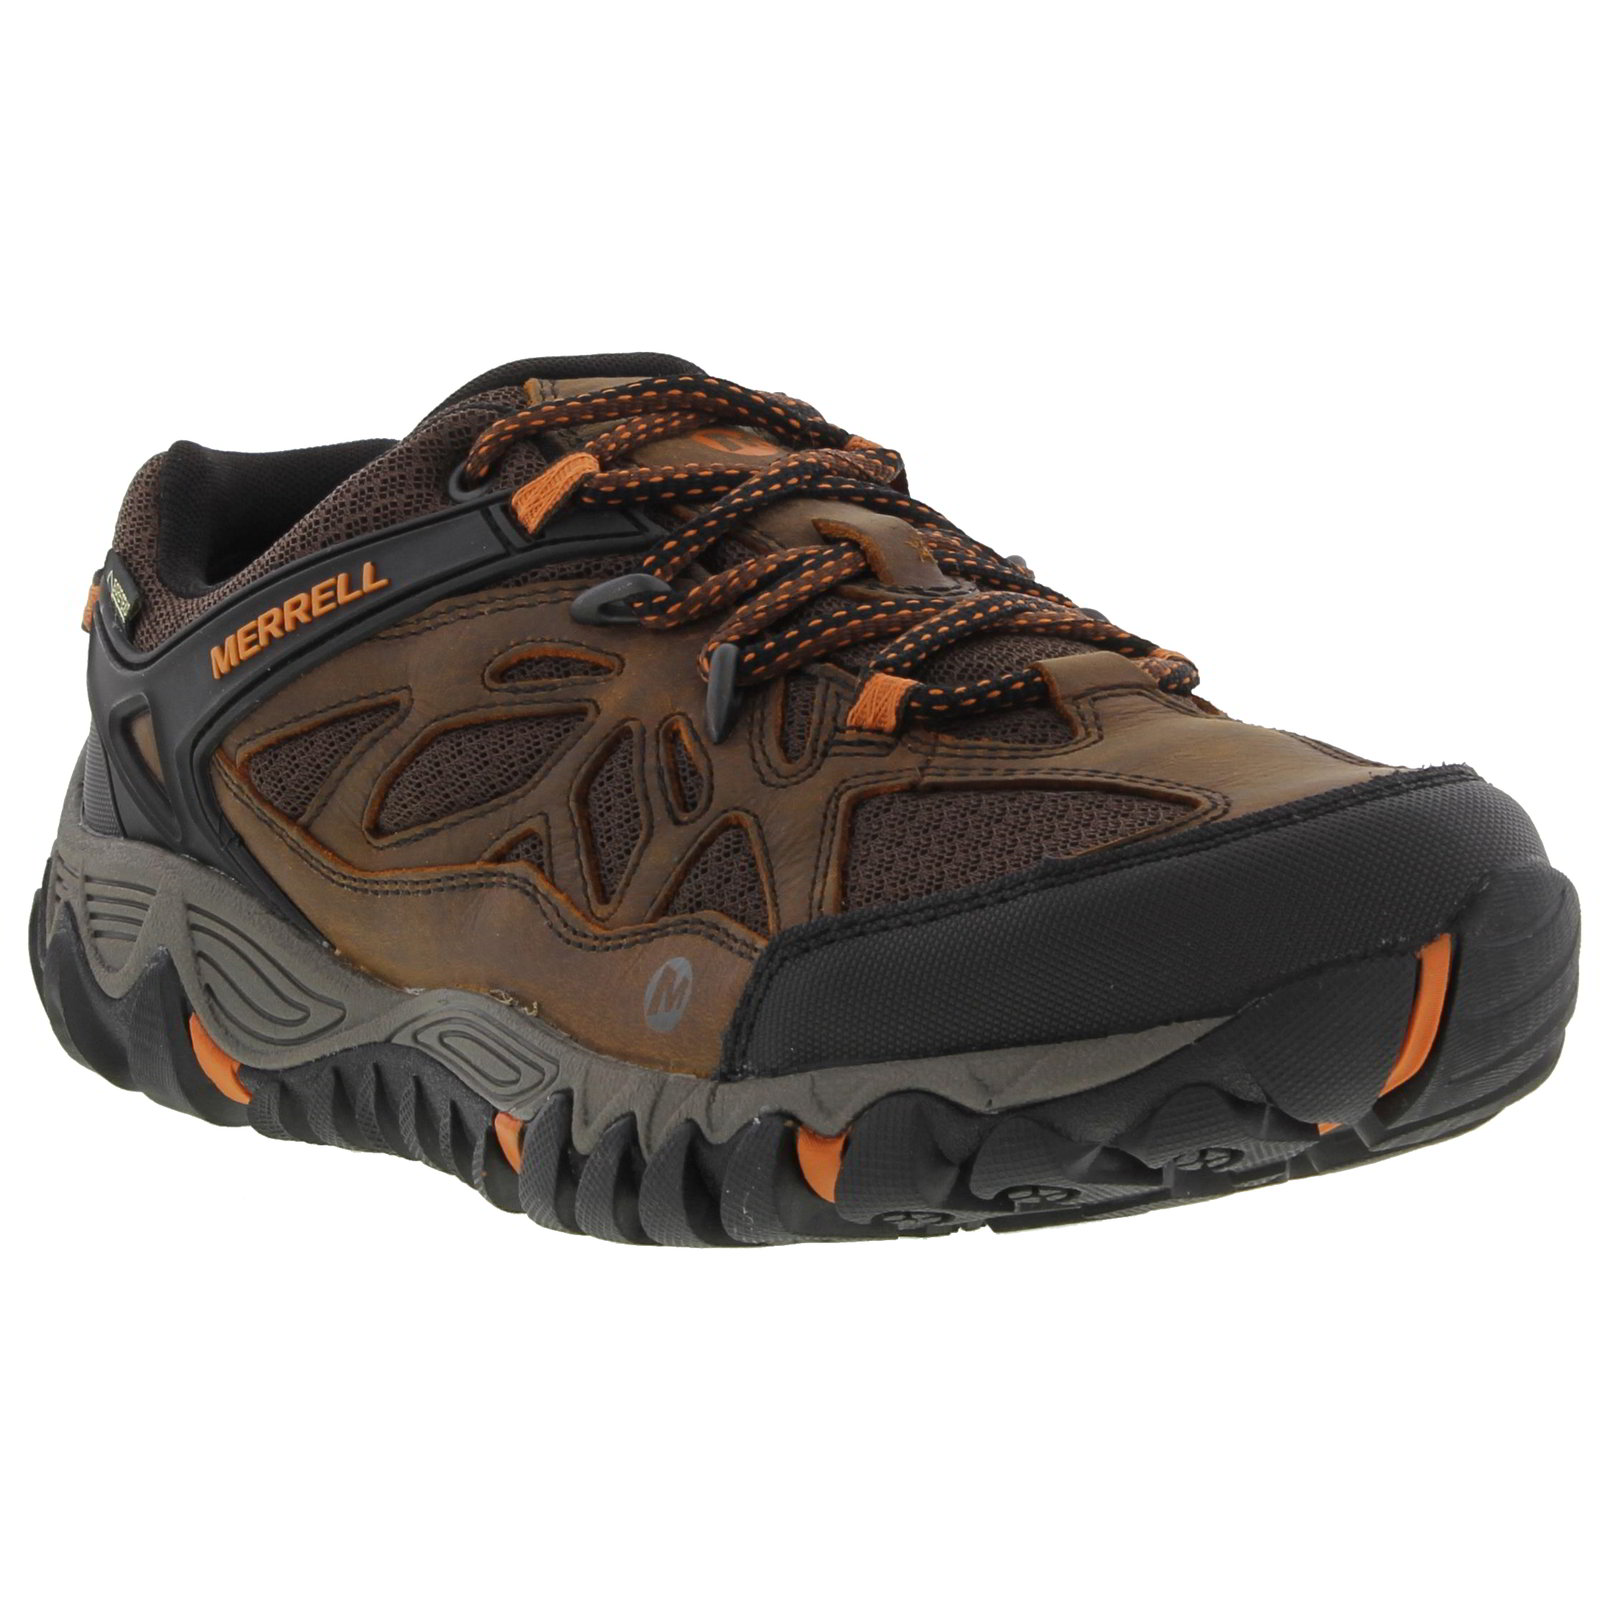 Merrell All Out Blaze Ventilator Gore Tex Mens Walking Shoes Brown